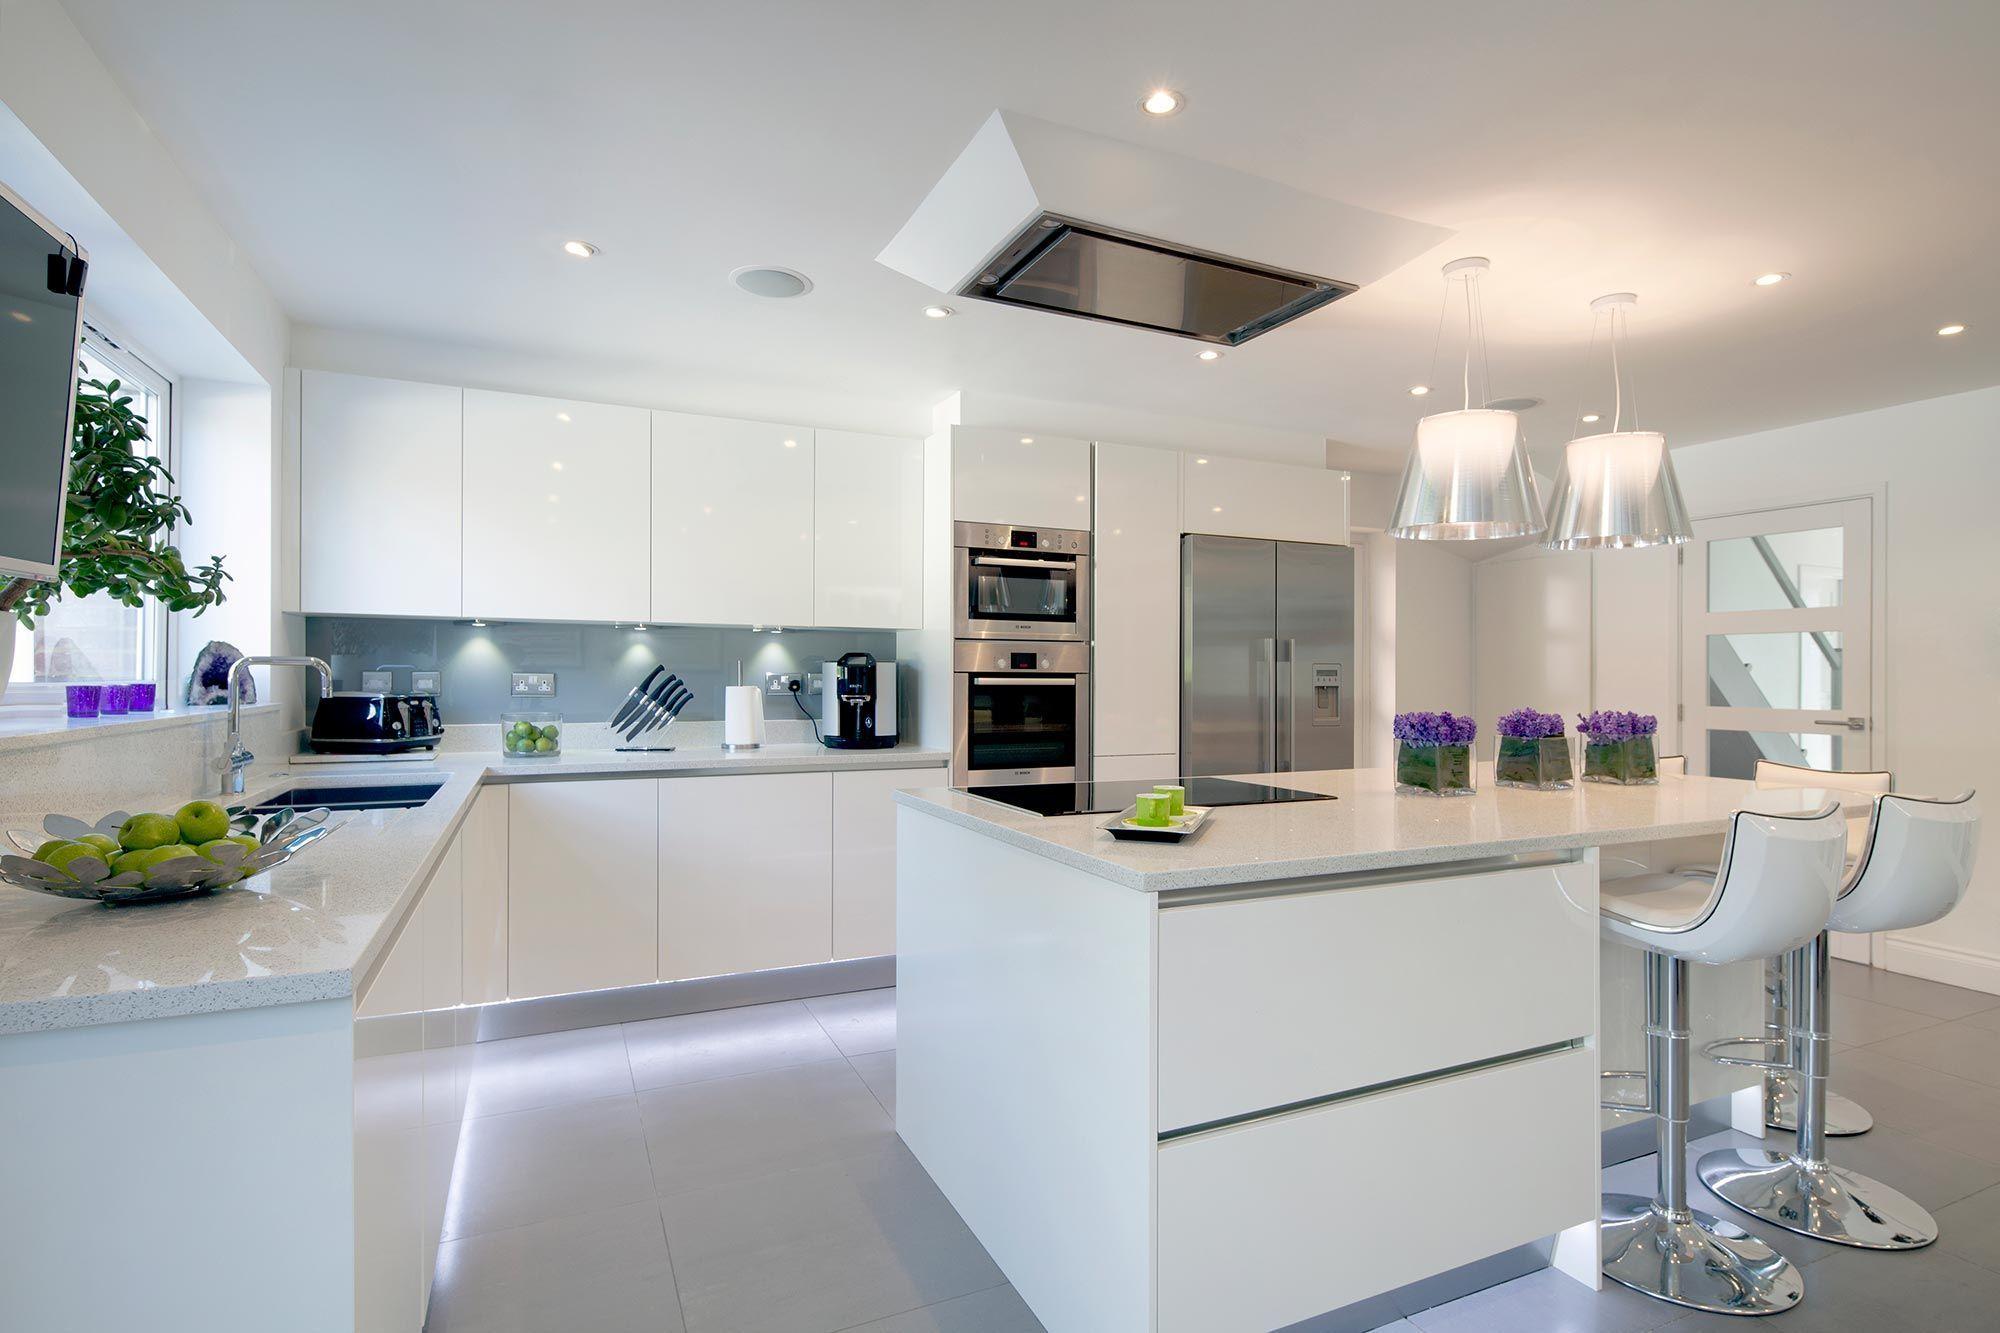 Kitchen Design Ideas #kitchenpantrycabinets